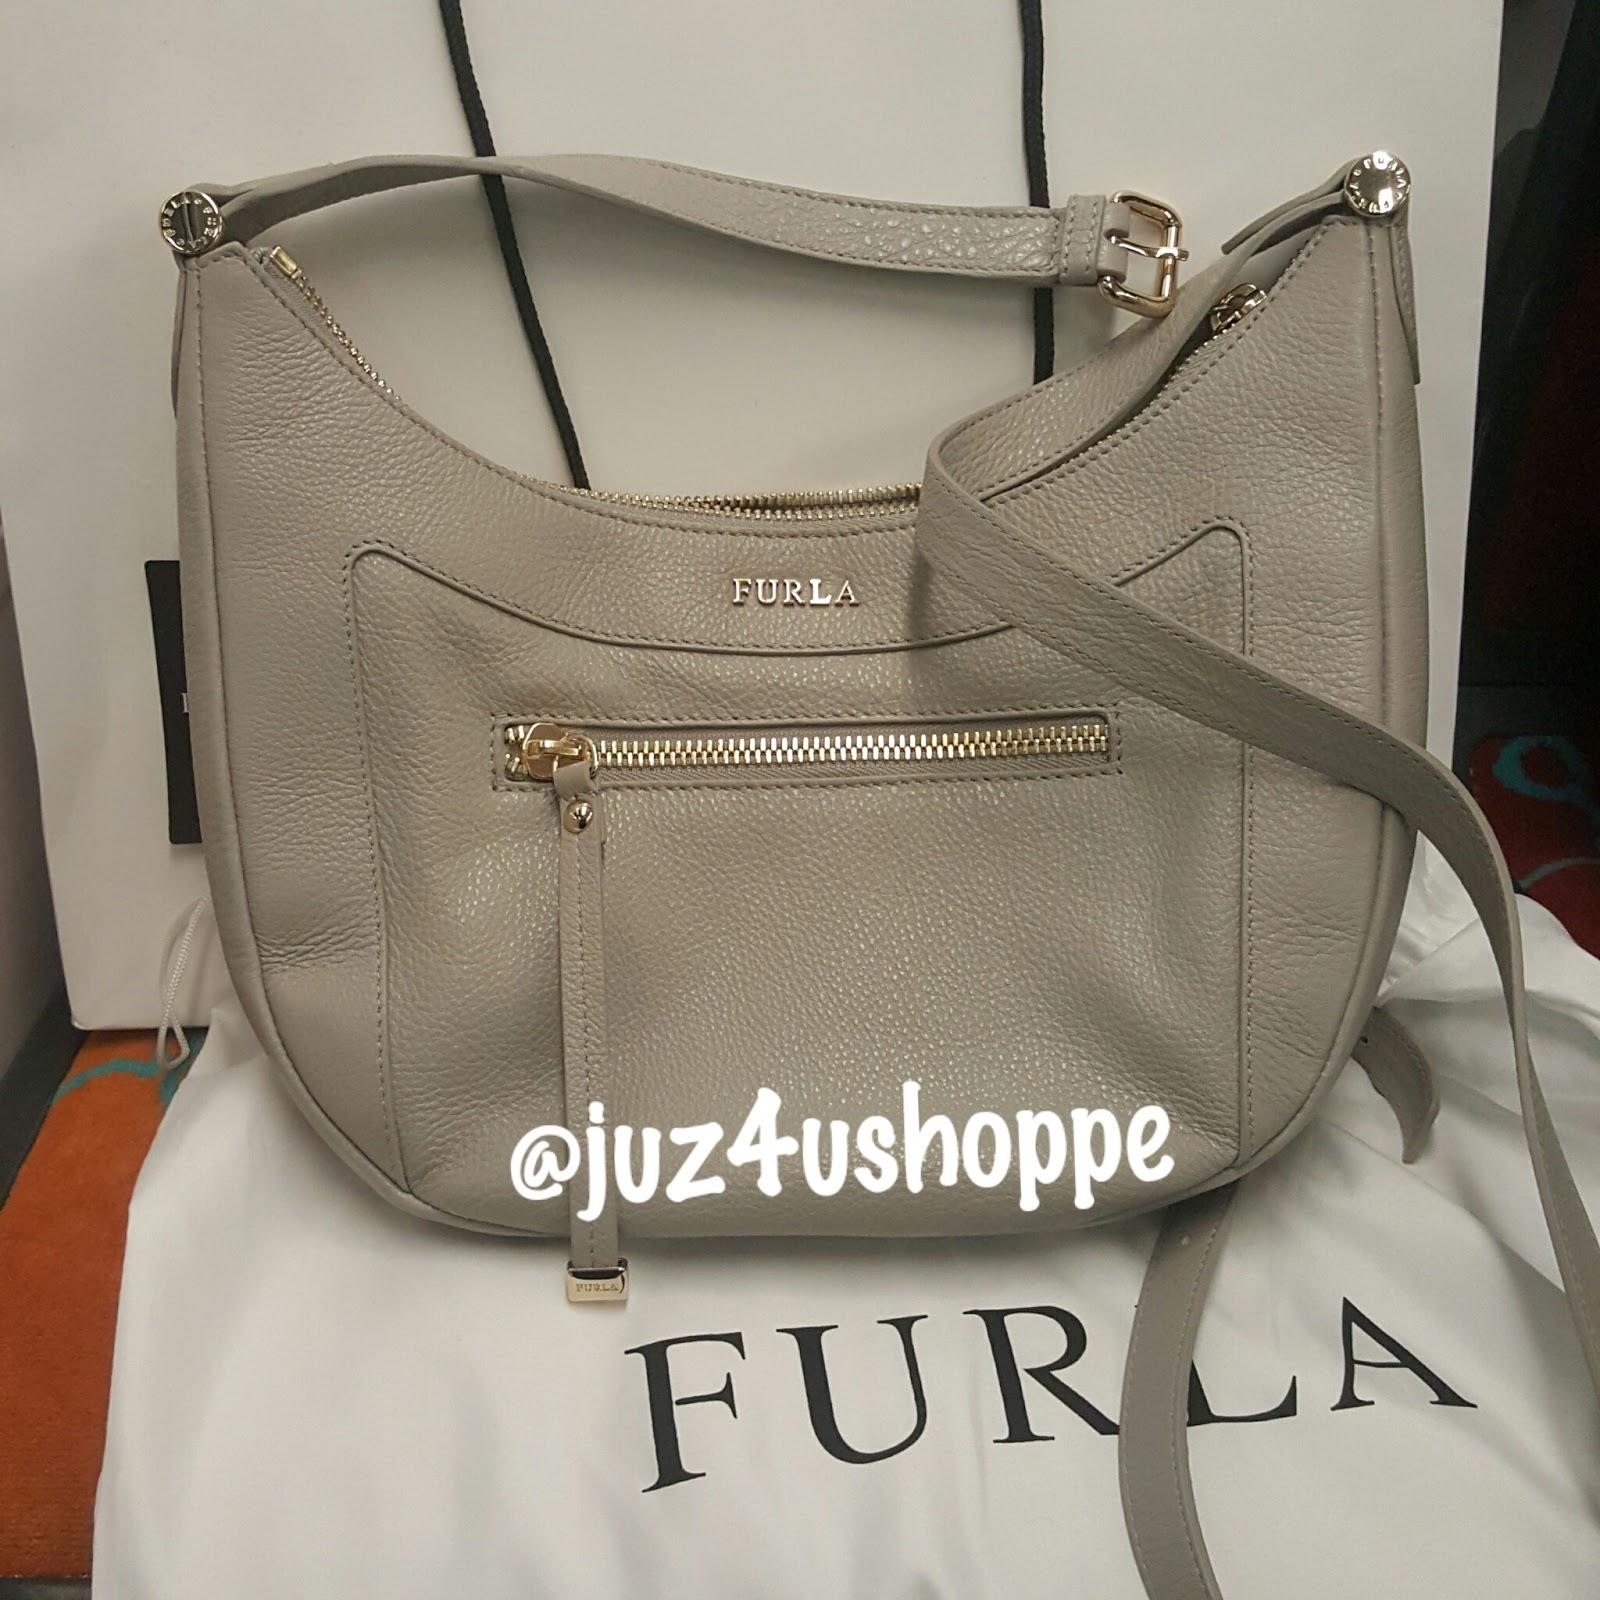 60daf78b1619 Furla Ginevra Leather Crossbody Bag. SOLD. Approximate size   8